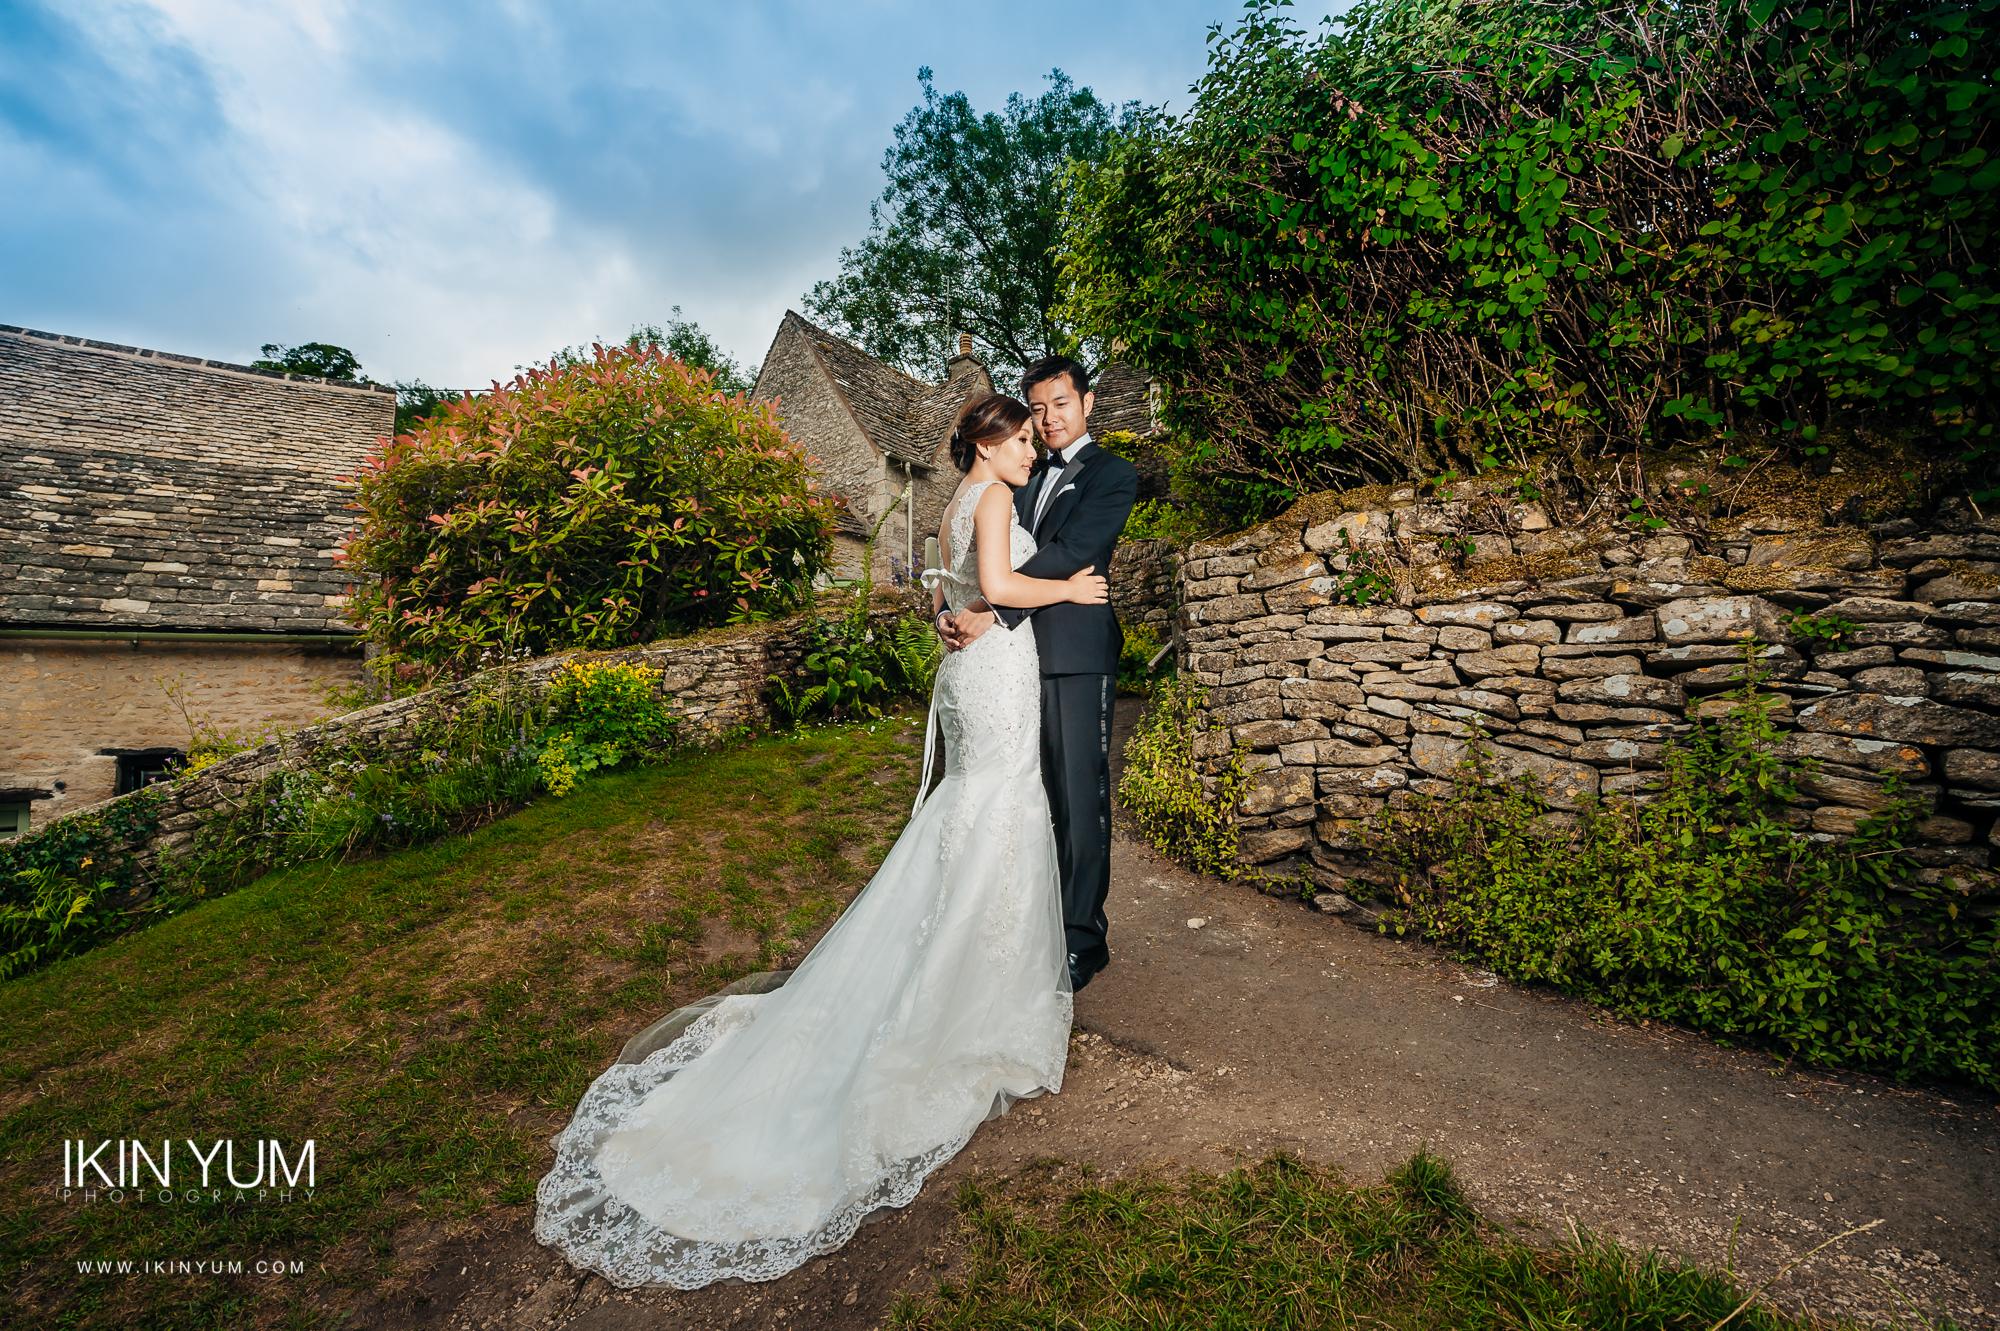 Carmen & Dennis Pre-Wedding Shoot - Ikin Yum Photography-013.jpg